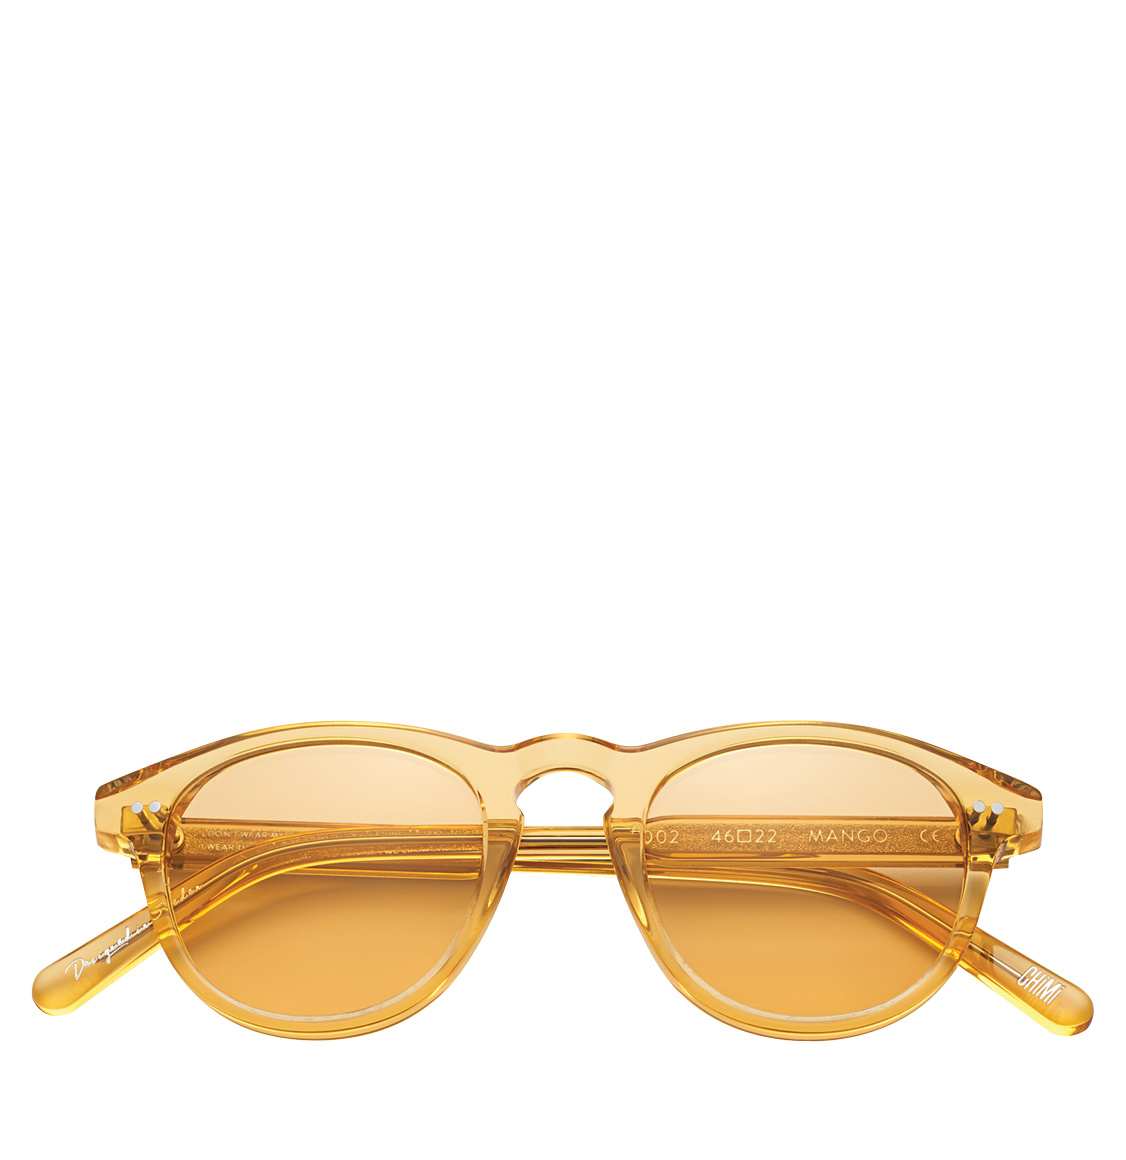 Chimi 002 Round Frame Mango Clear 46 Γυαλιά Ηλίου